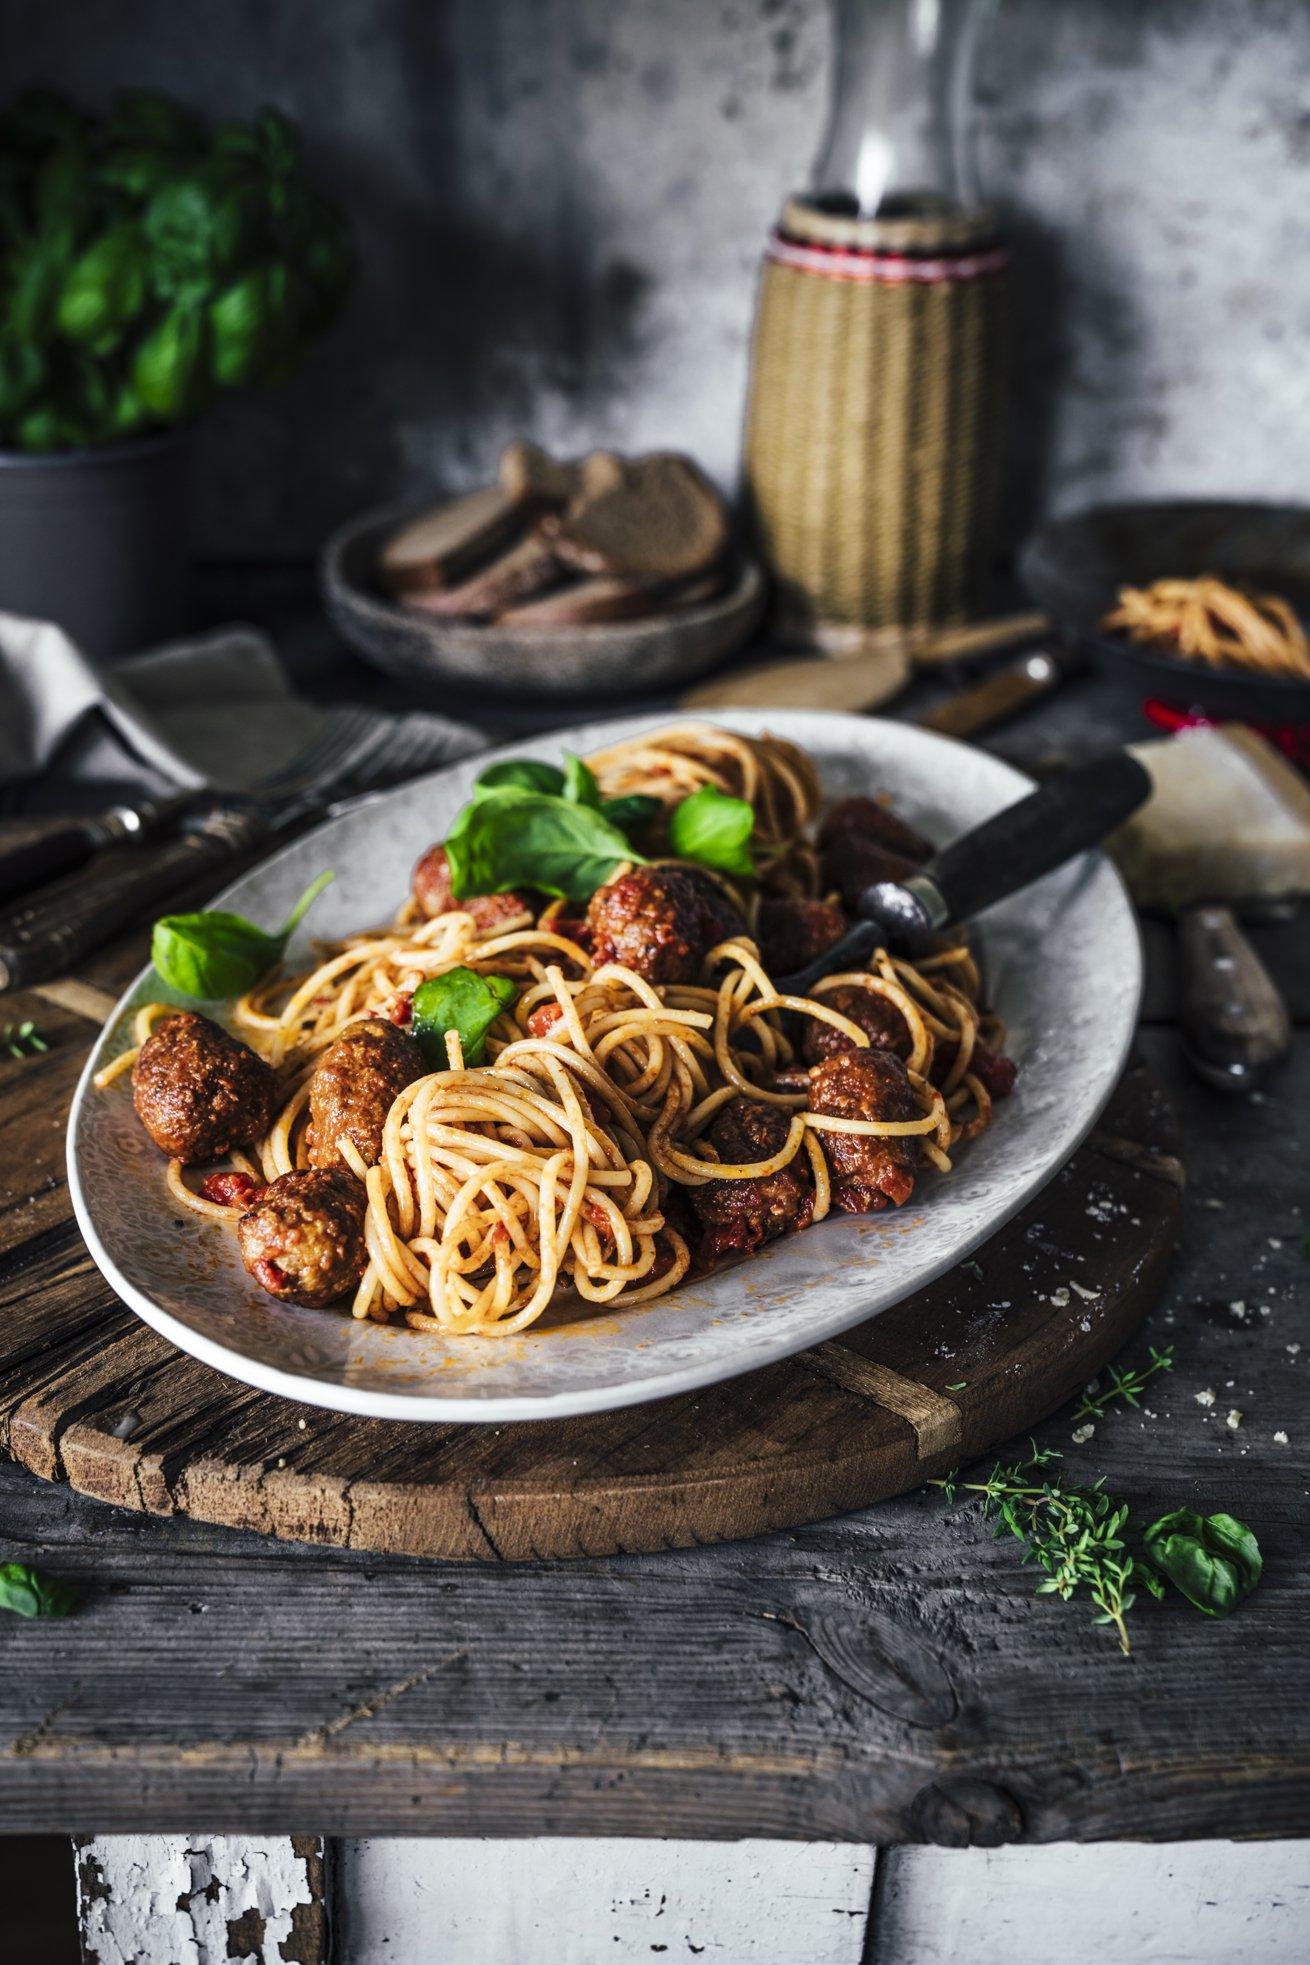 Spaghetti mit Tomatensauce und Salsiccia Bällchen